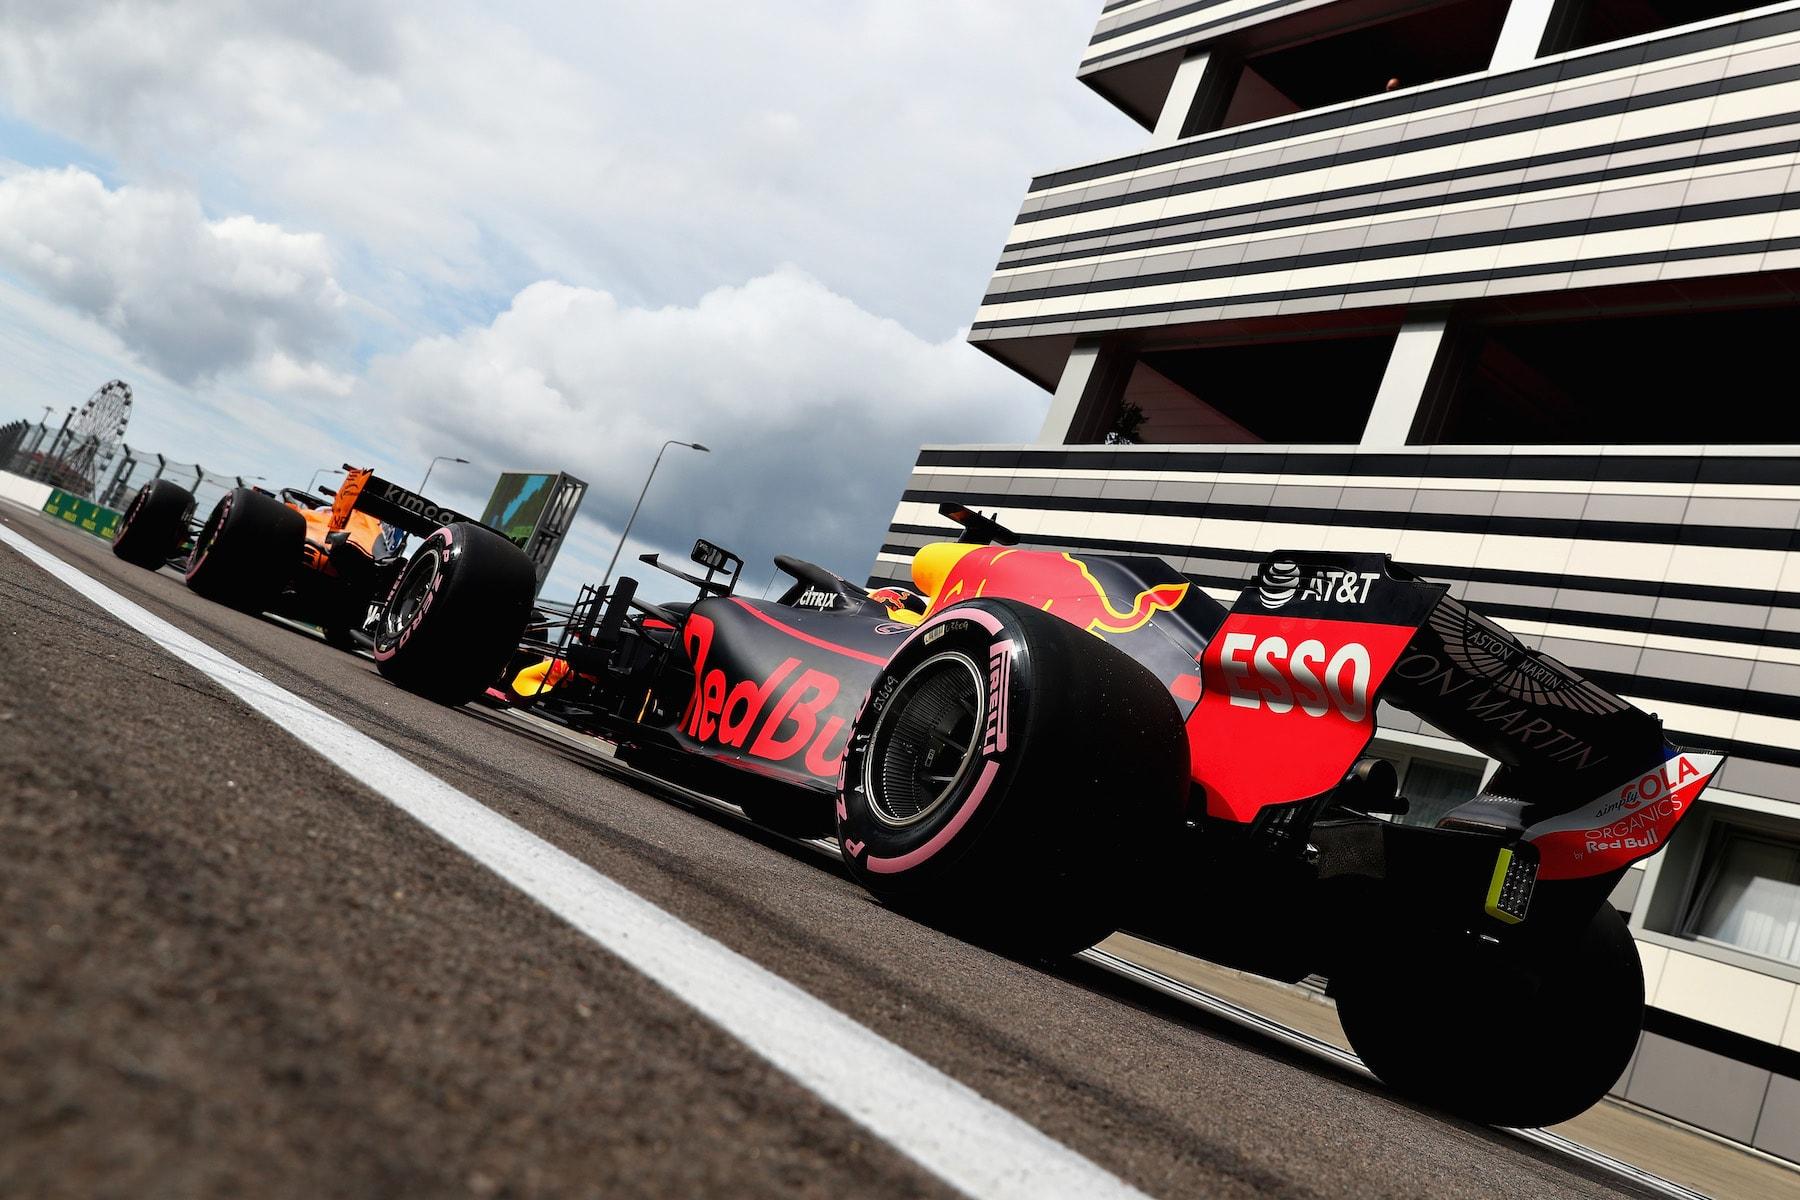 2018 Daniel Ricciardo | Red Bull RB14 | 2018 Russian GP FP1 2 copy.jpg